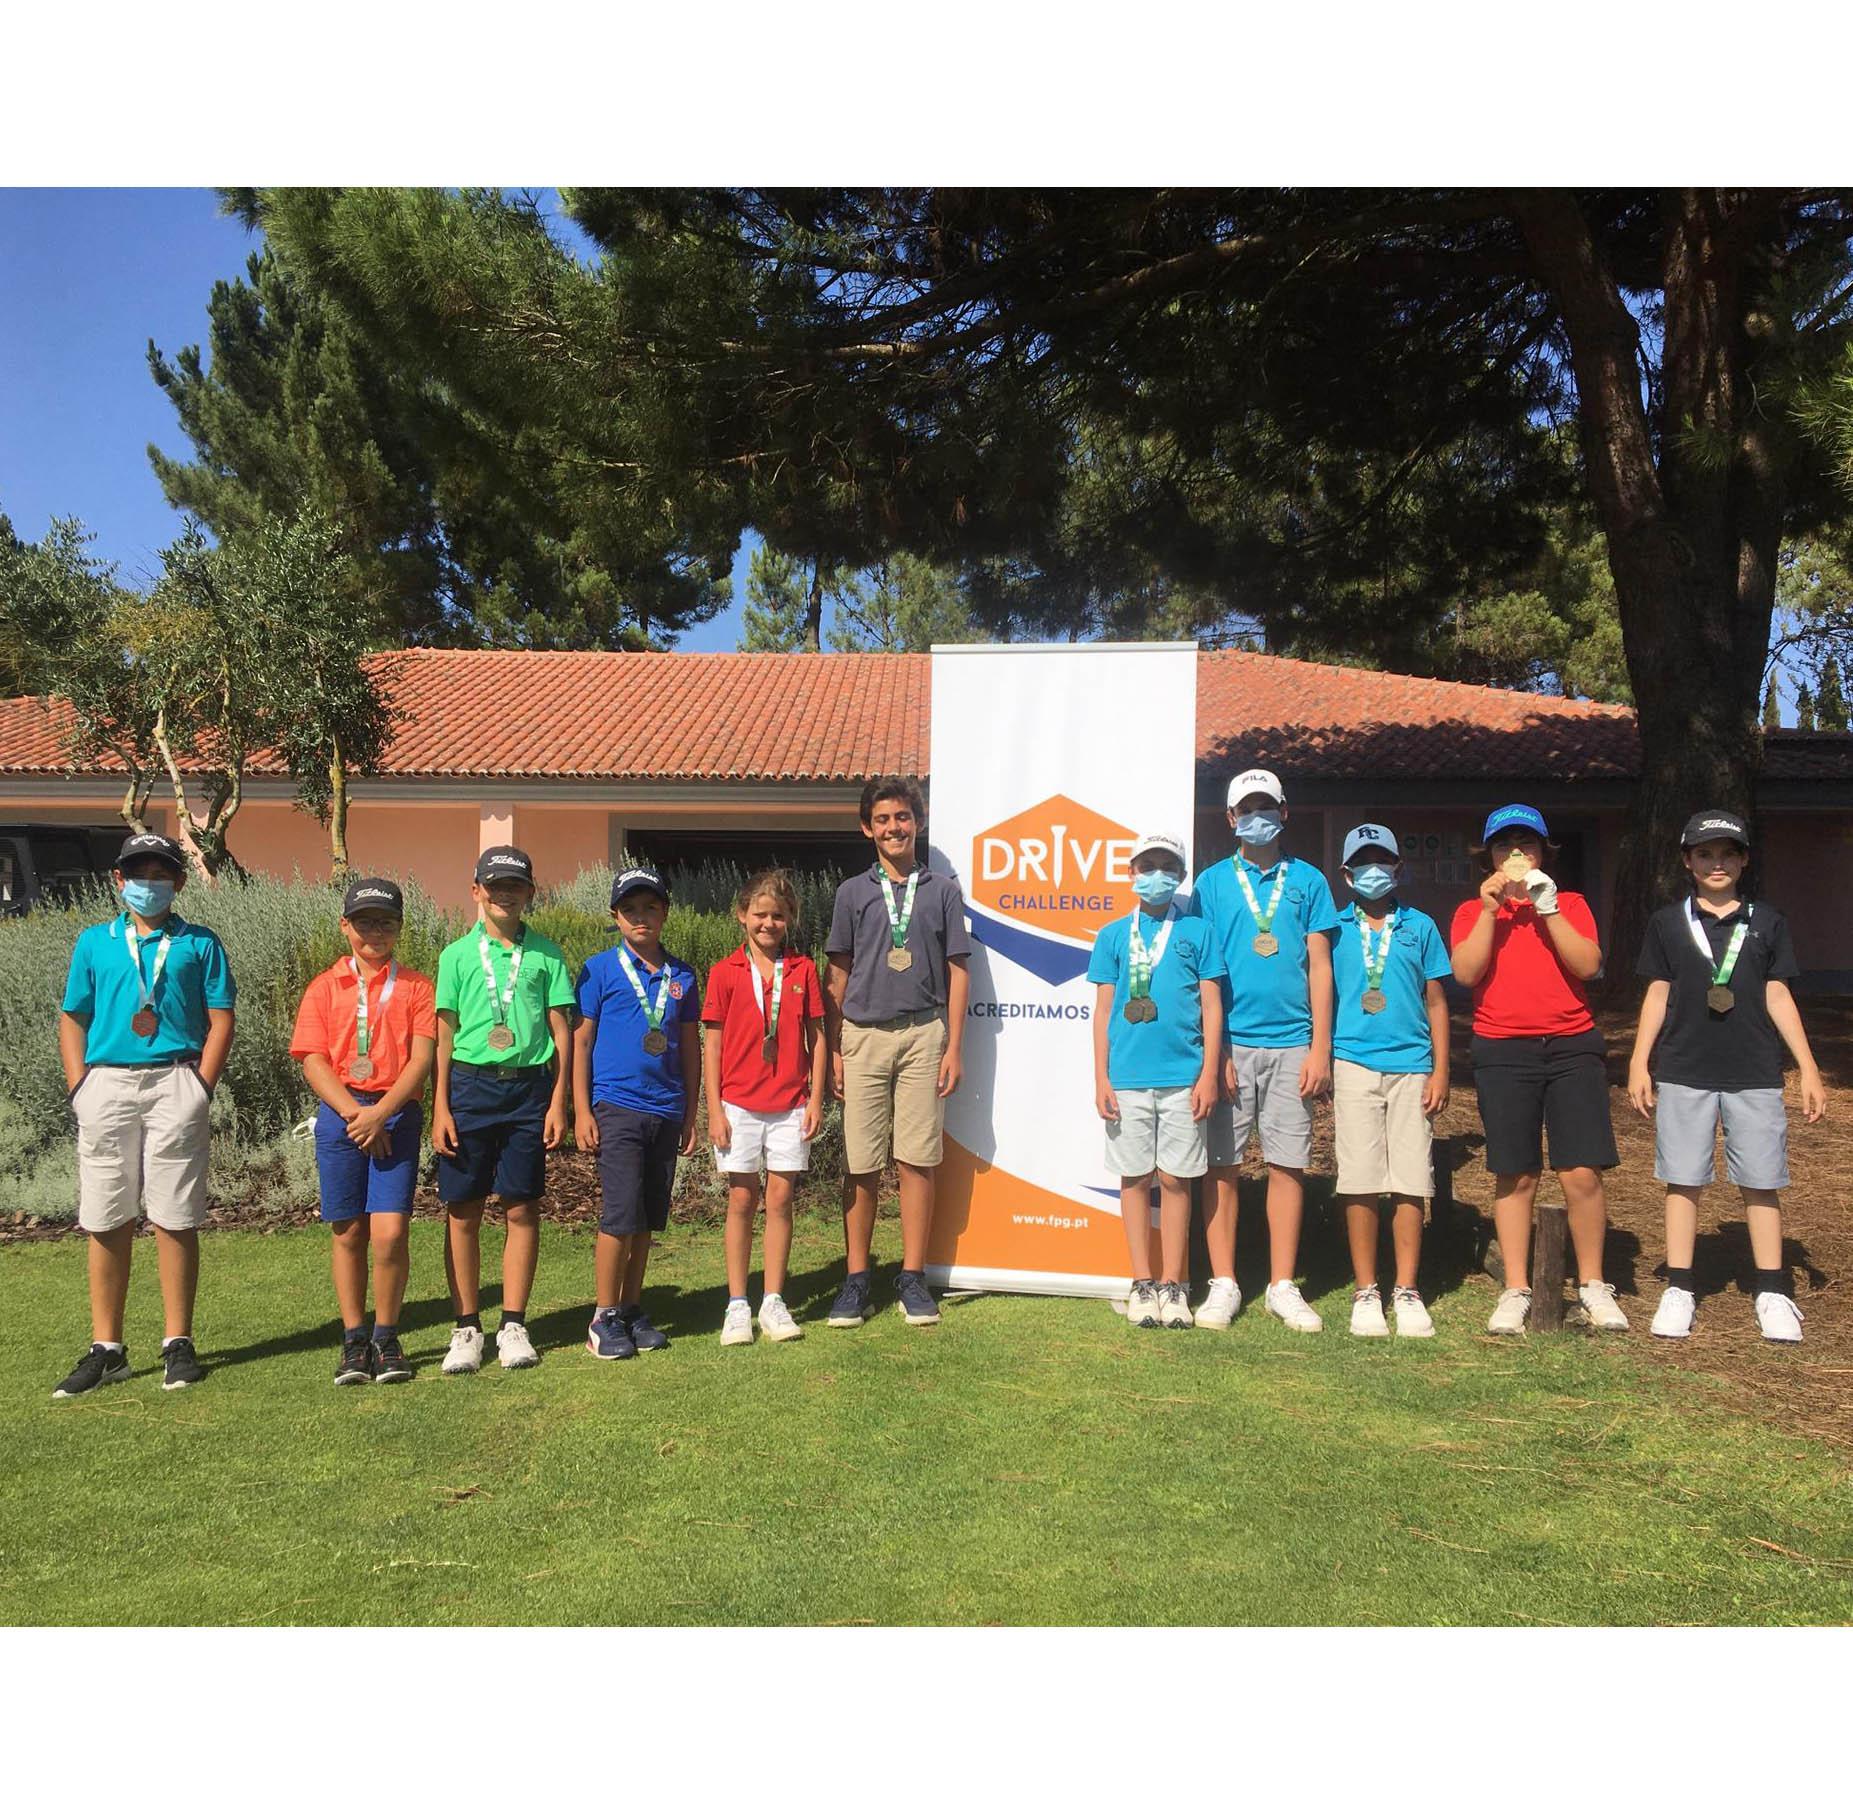 Quinta do Peru recebe 5.º Torneio Drive Challenge Tejo